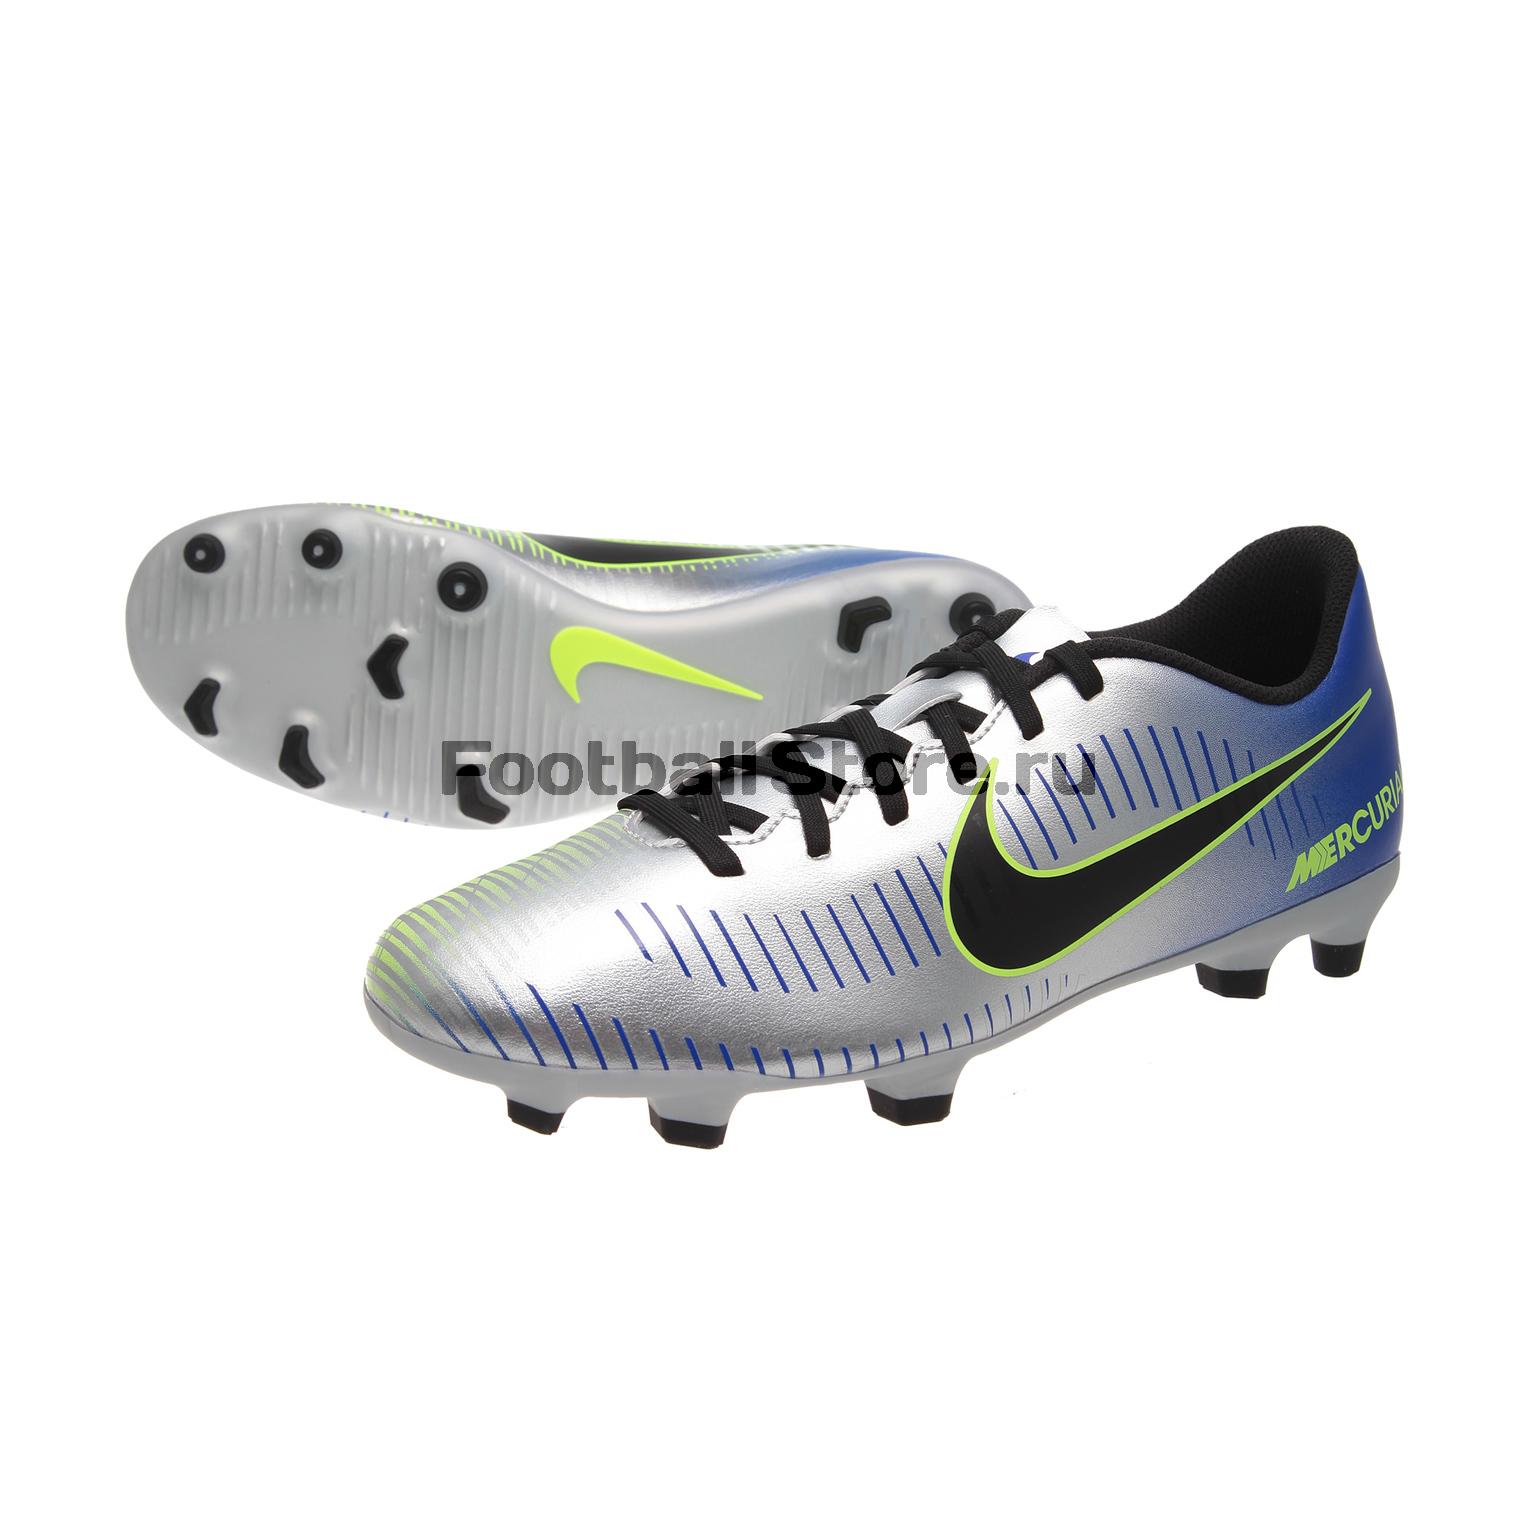 Бутсы Nike Mercurial Vortex III Neymar FG 921511-407 бутсы футбольные nike mercurial victory vi njr fg 921488 407 jr детские